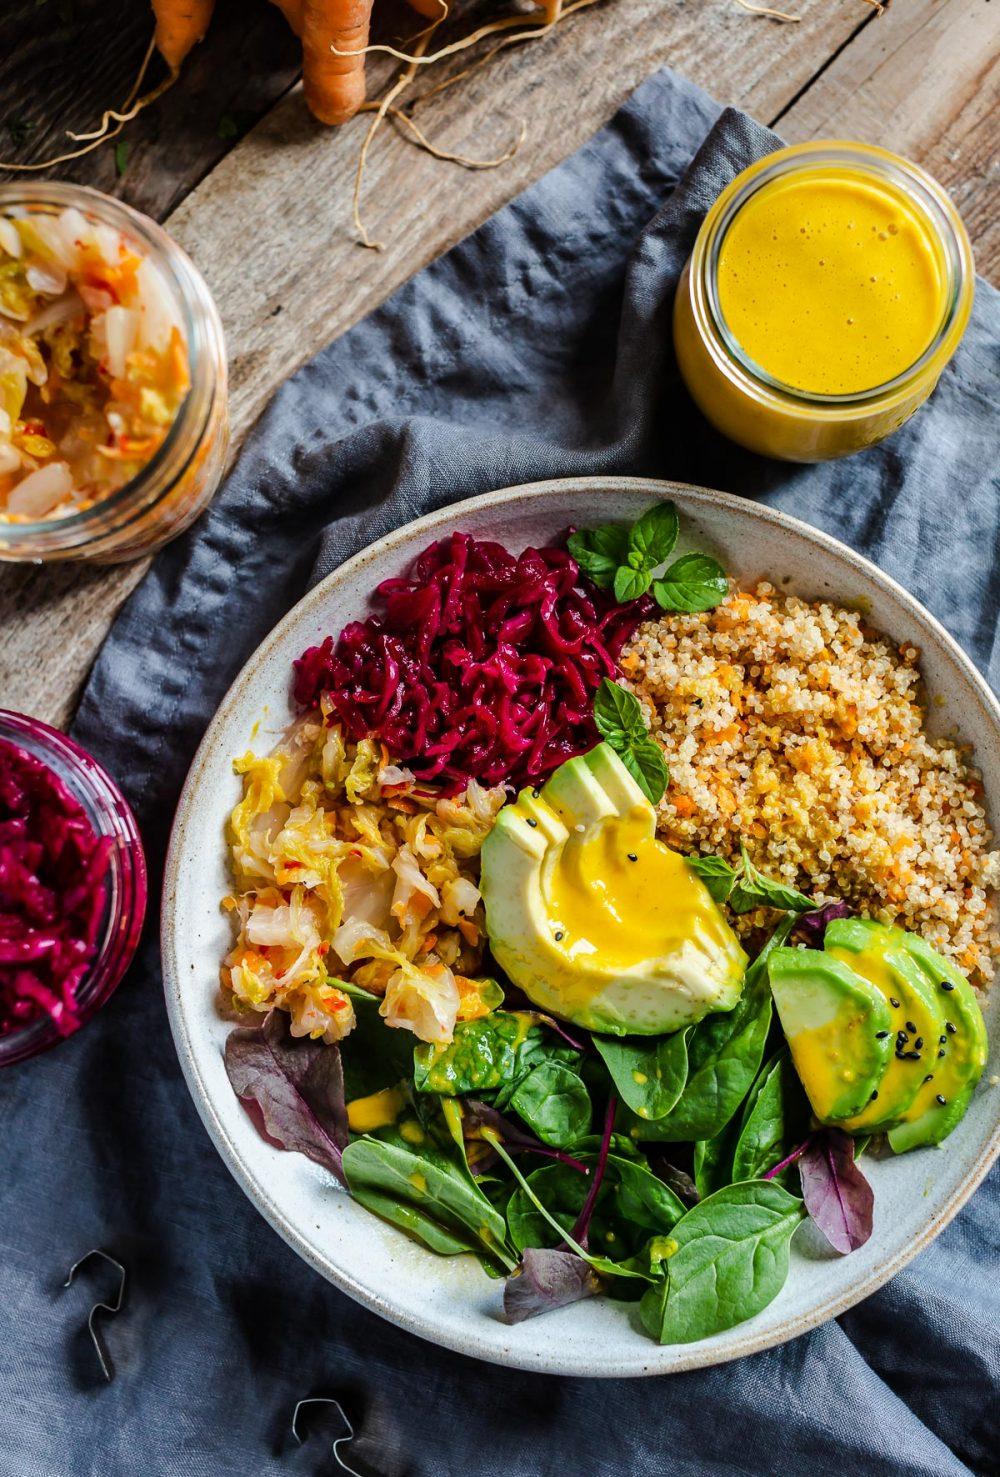 healthy vegan CARROT GINGER DRESSING for salads and buddha bowls dressing alle CAROTE e ZENZERO condimento per insalate insaltone ricetta light